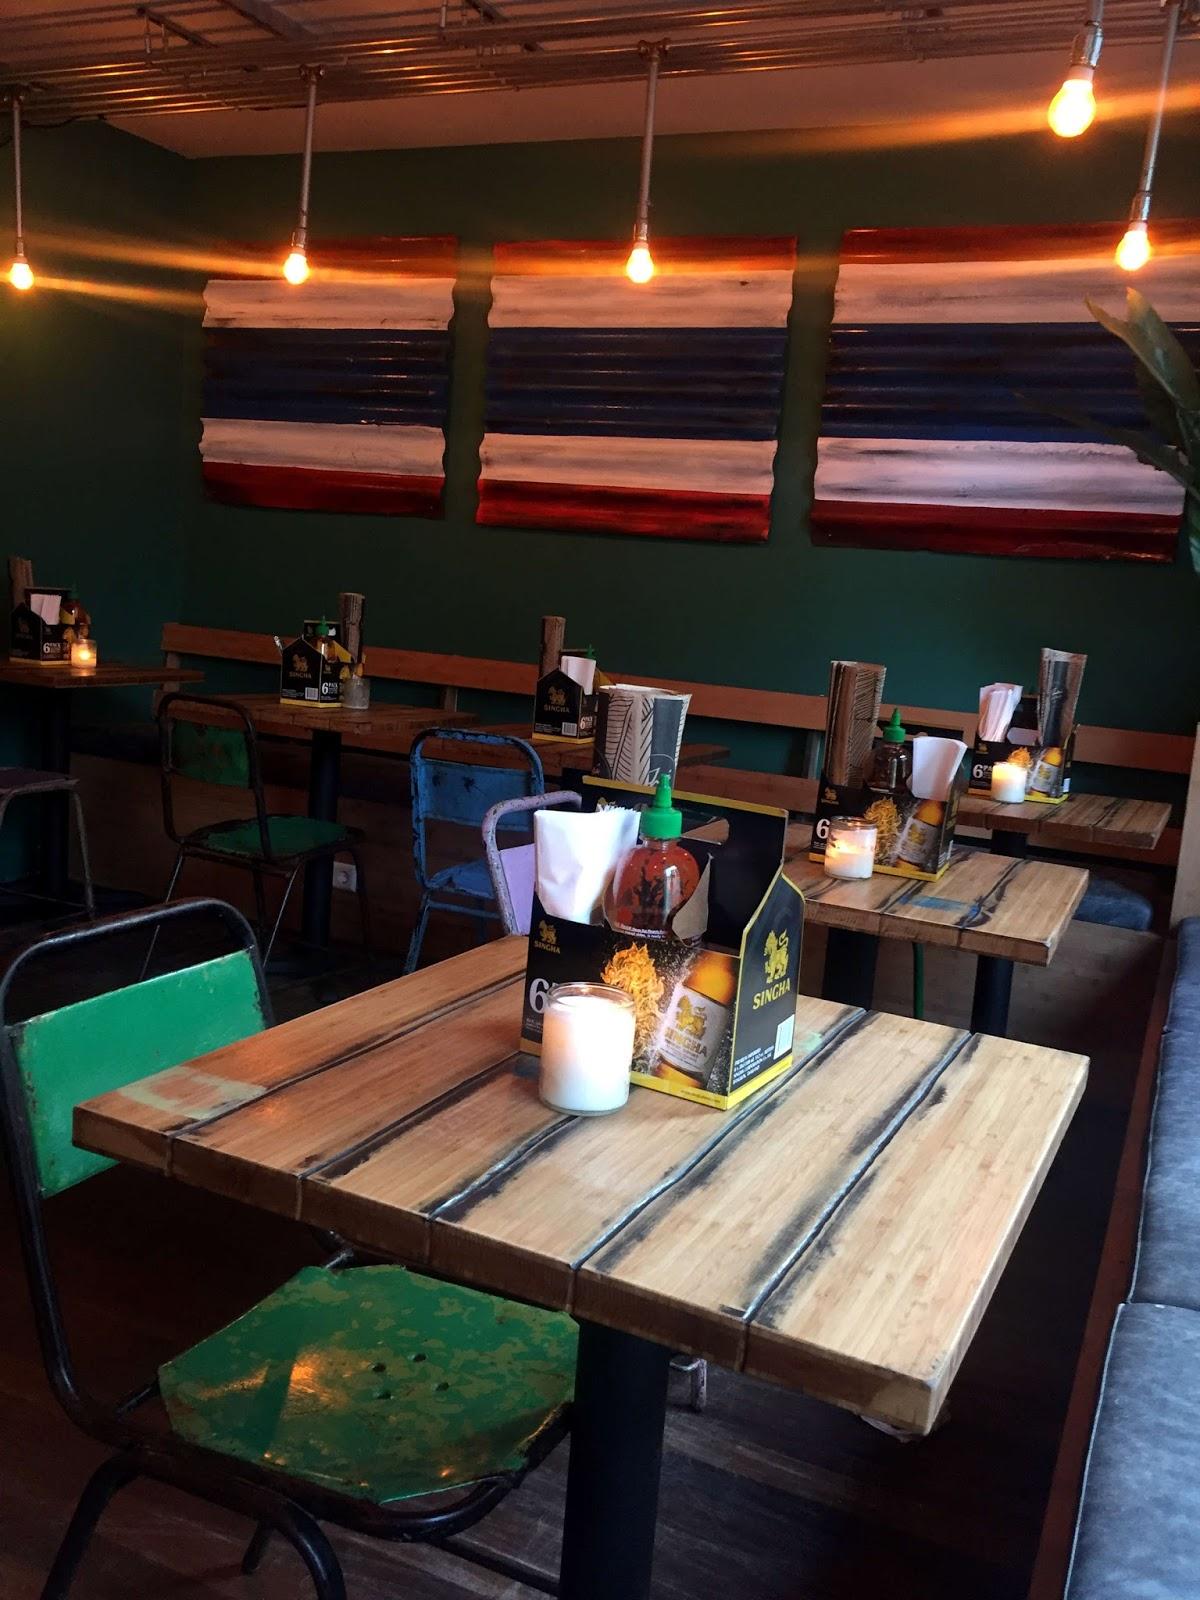 Stitch & Bear - Soi74 Thai Food Cafe - Interior